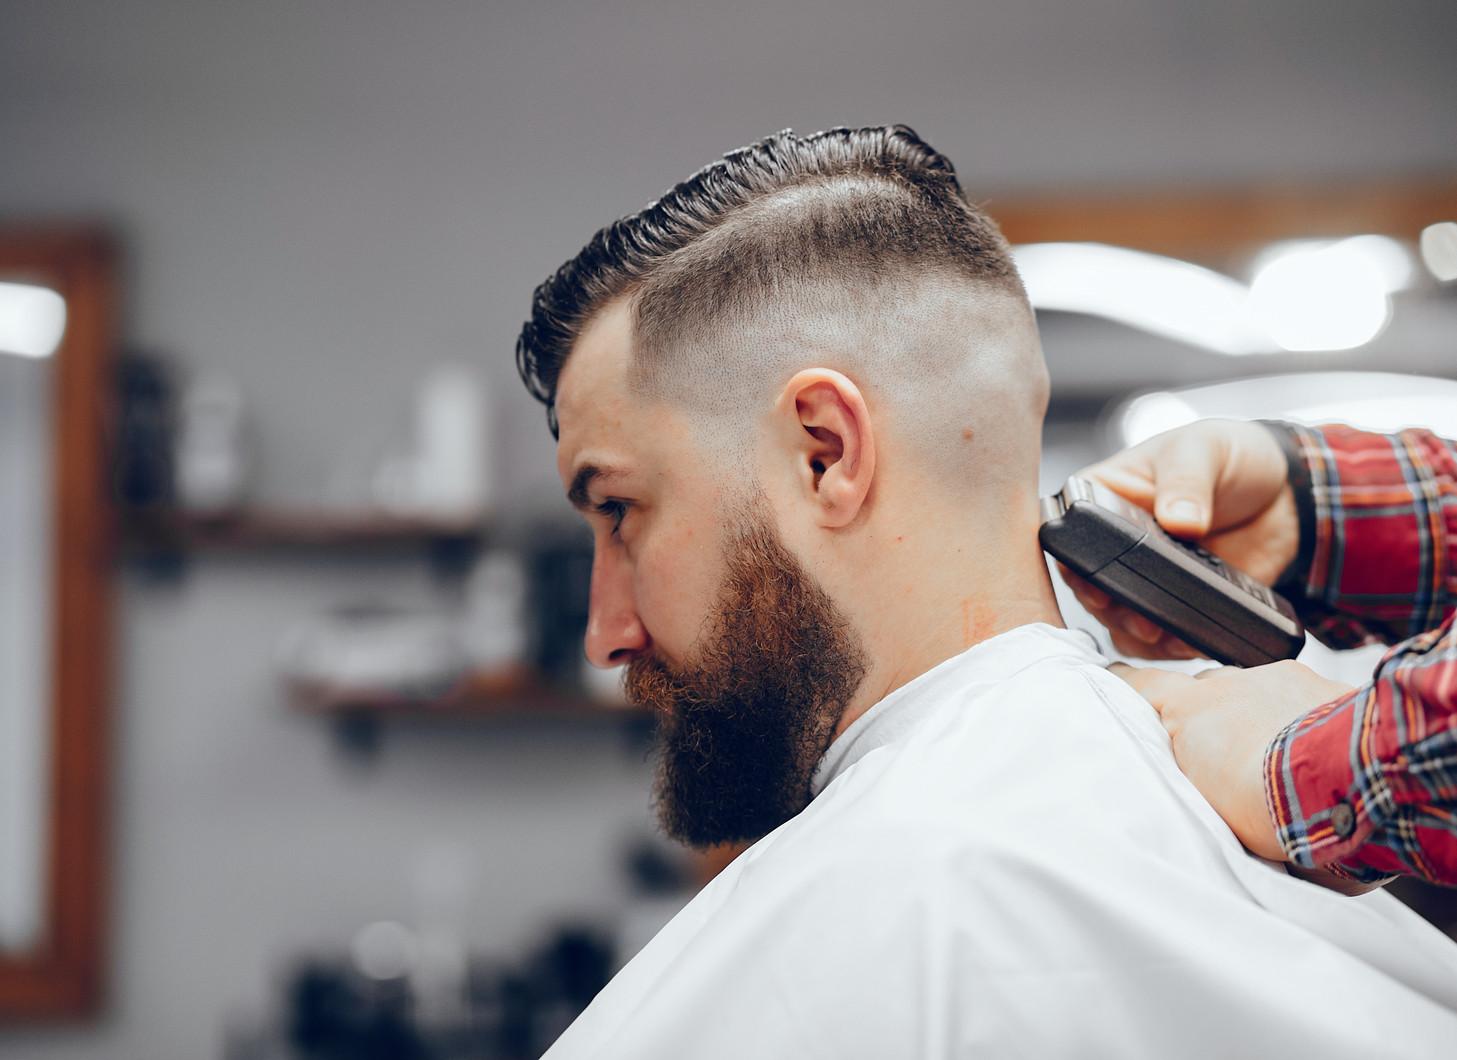 stylish-man-sitting-barbershop-2.jpg